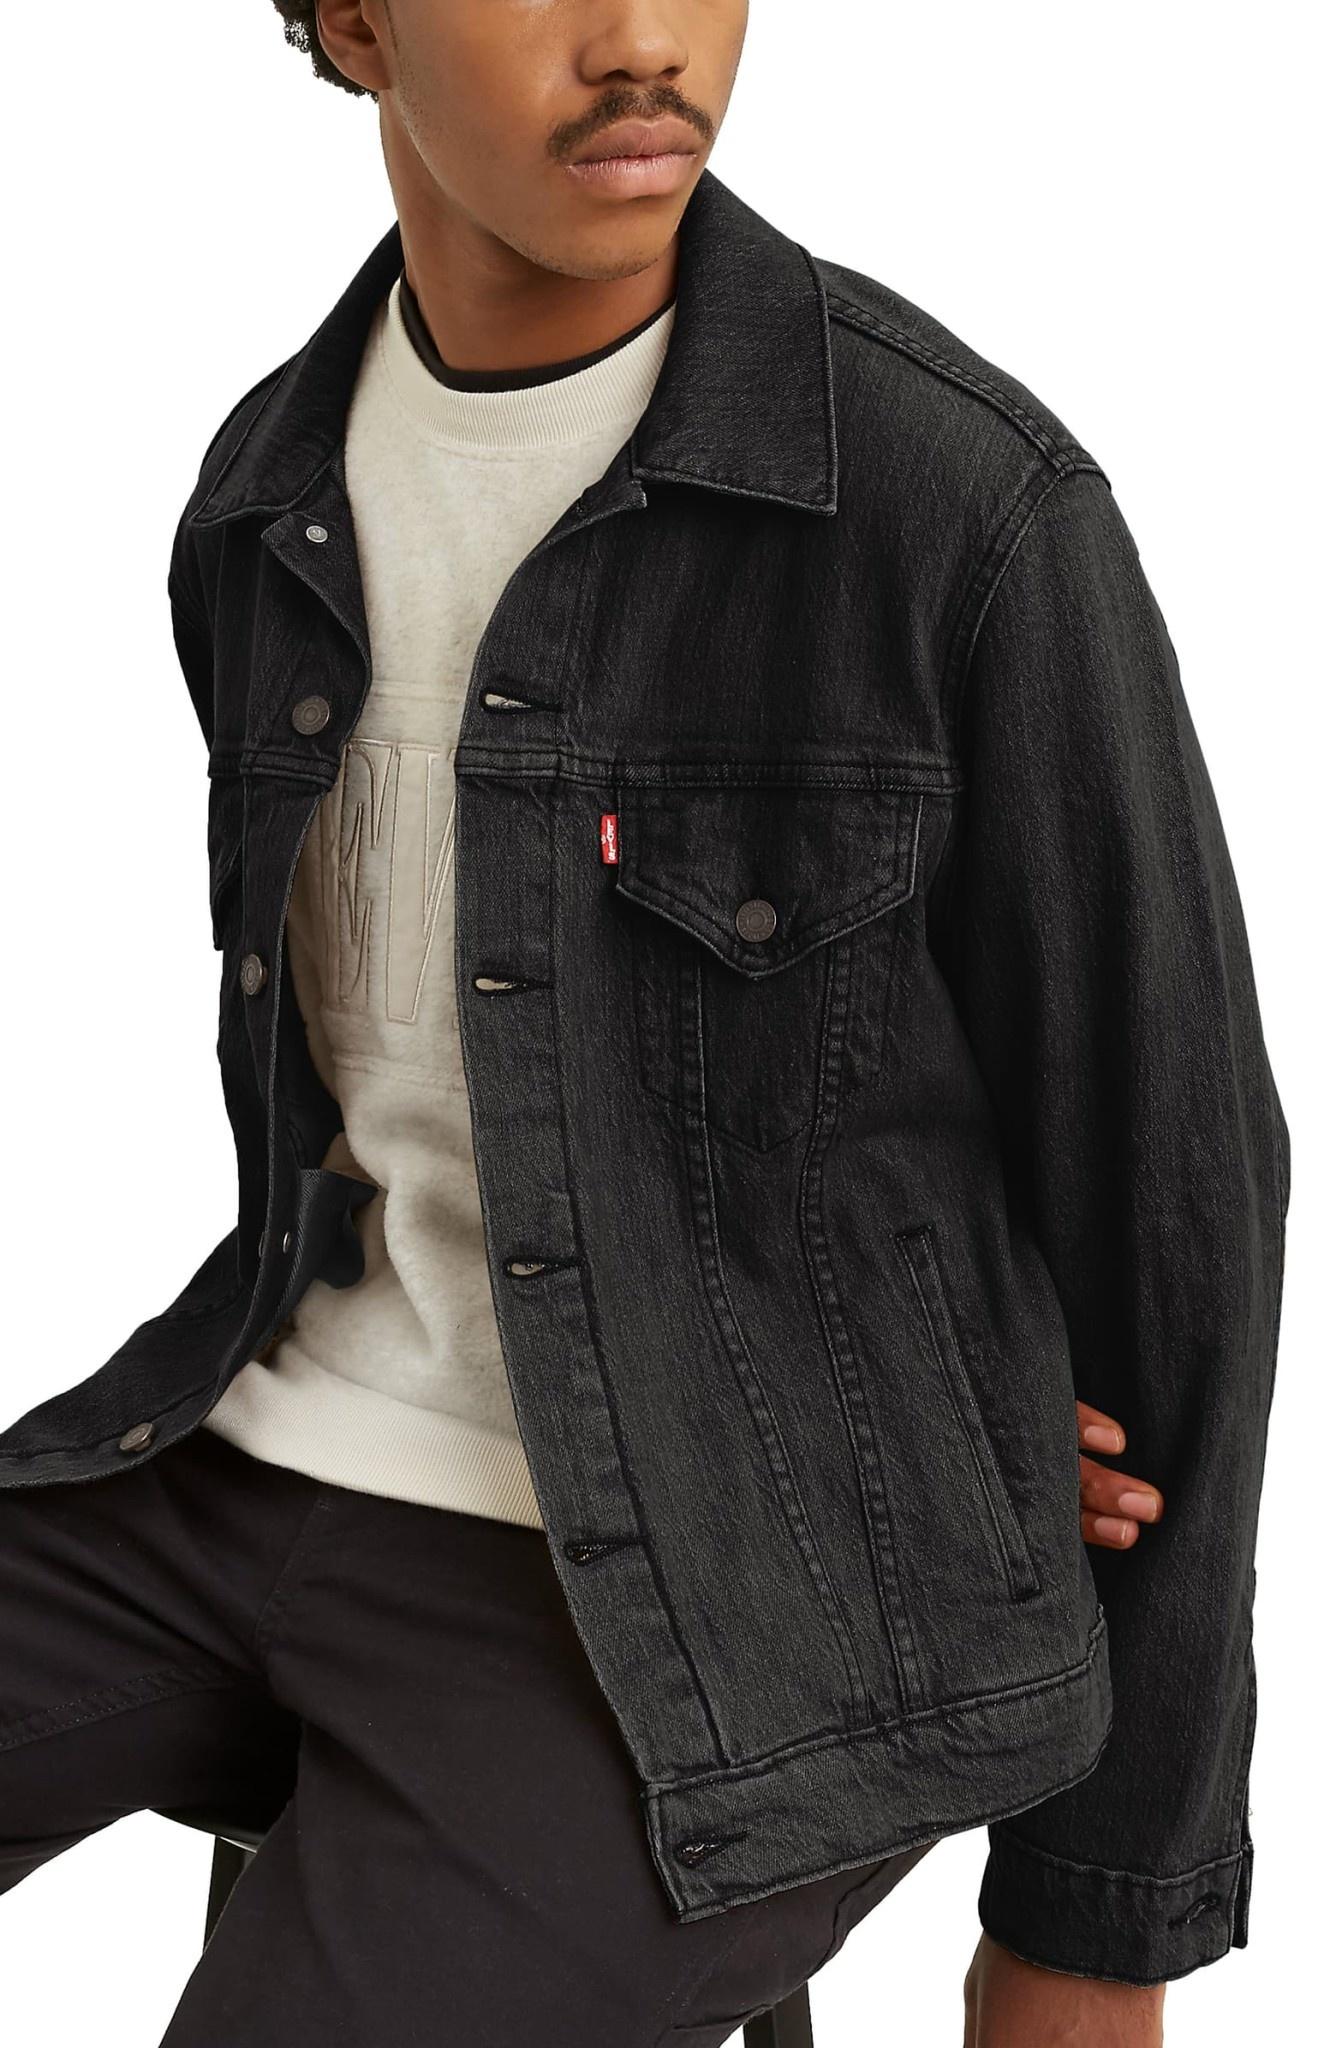 LEVI'S VINTAGE FIT TRUCKER 77380-0013 BLACK-4